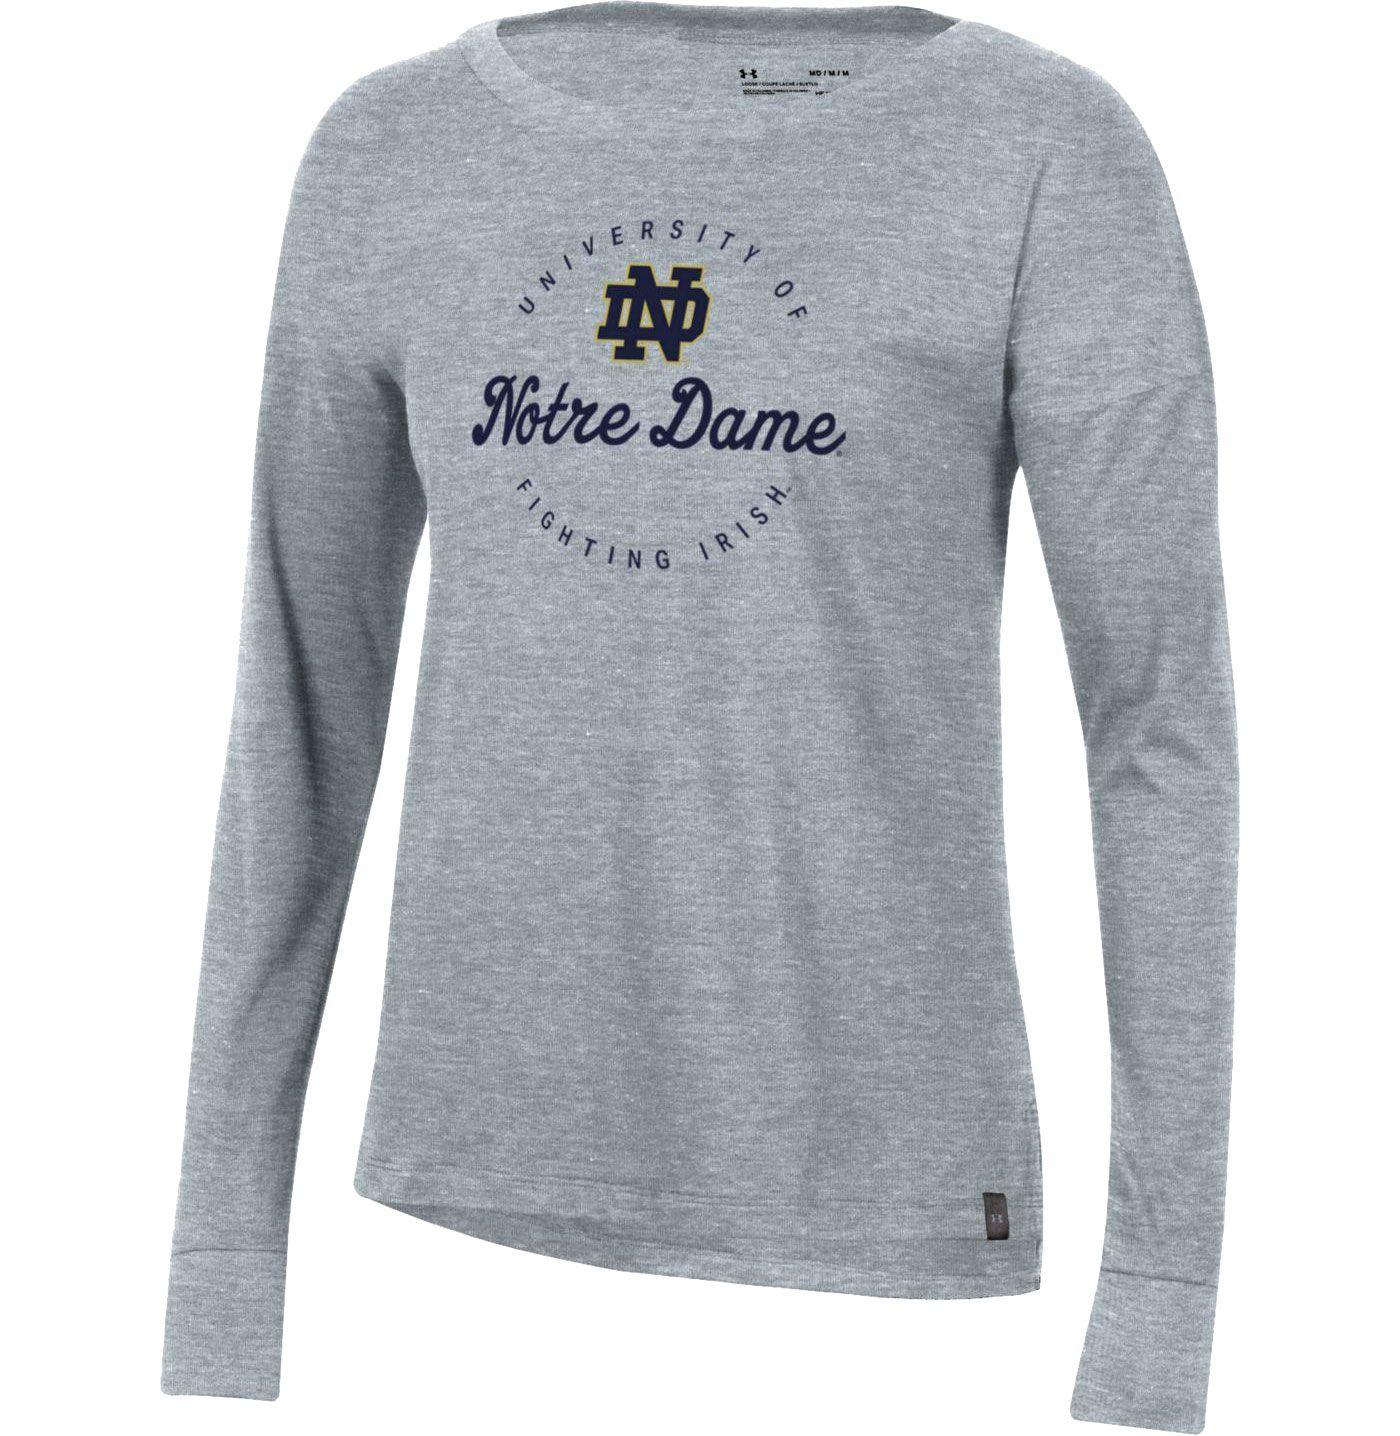 Under Armour Women's Notre Dame Fighting Irish Grey Performance Cotton Long Sleeve T-Shirt